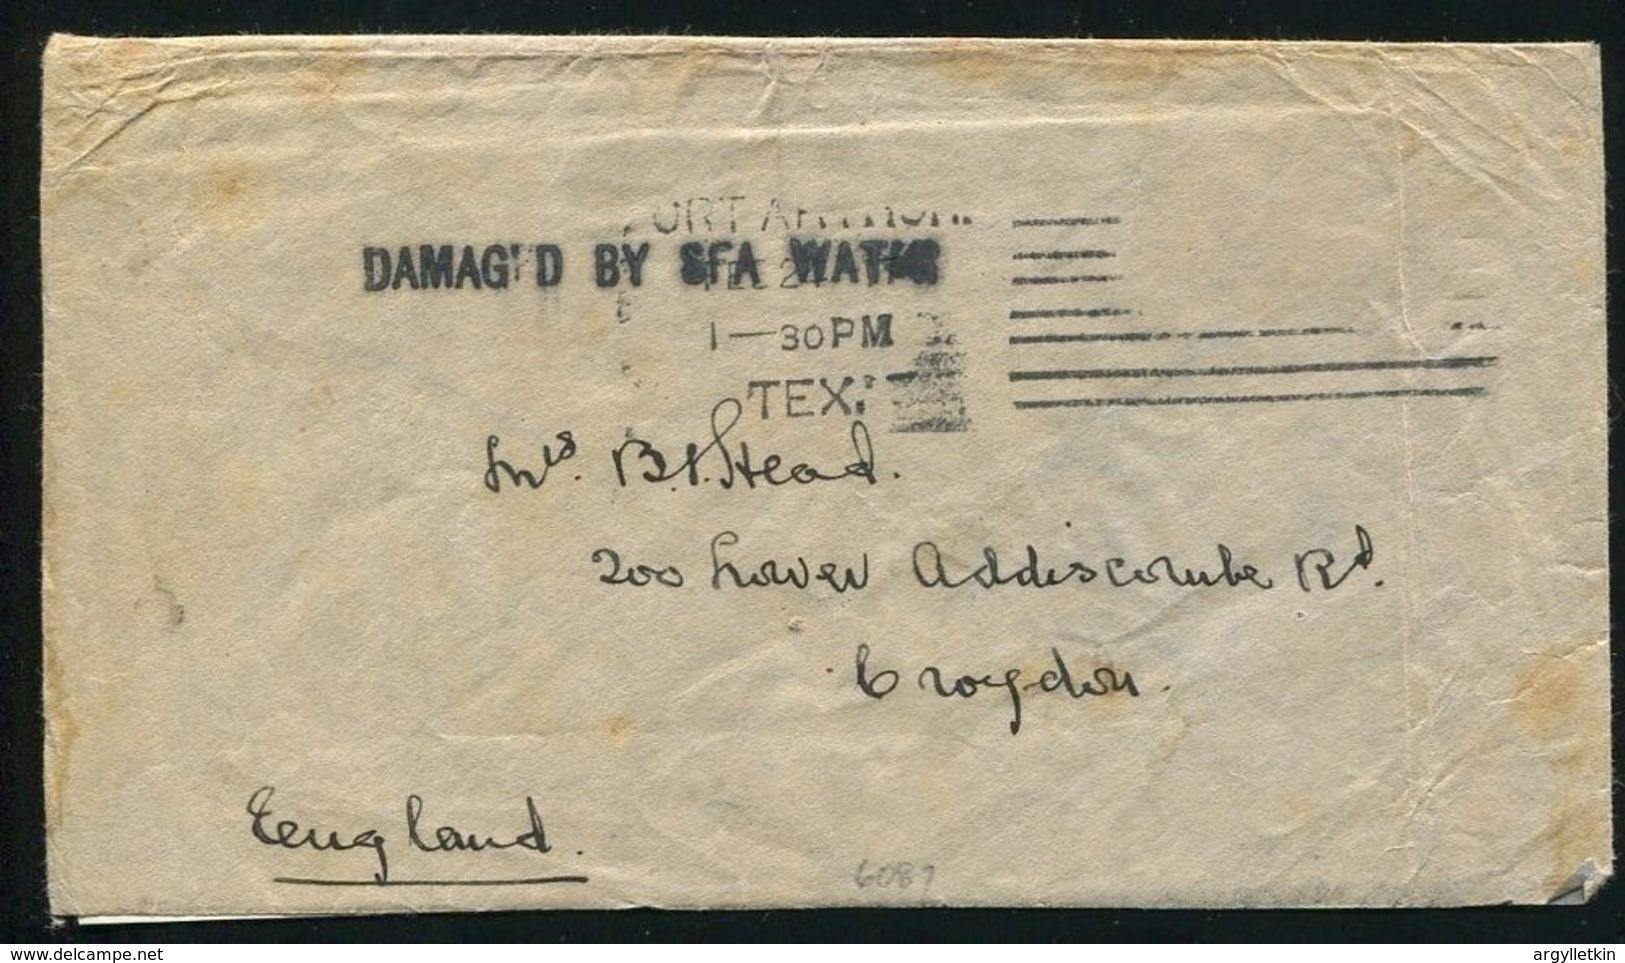 IRELAND CRASH AND WRECK NORWEGIAN WORLD WAR I PORT ARTHUR TEXAS - Postmark Collection